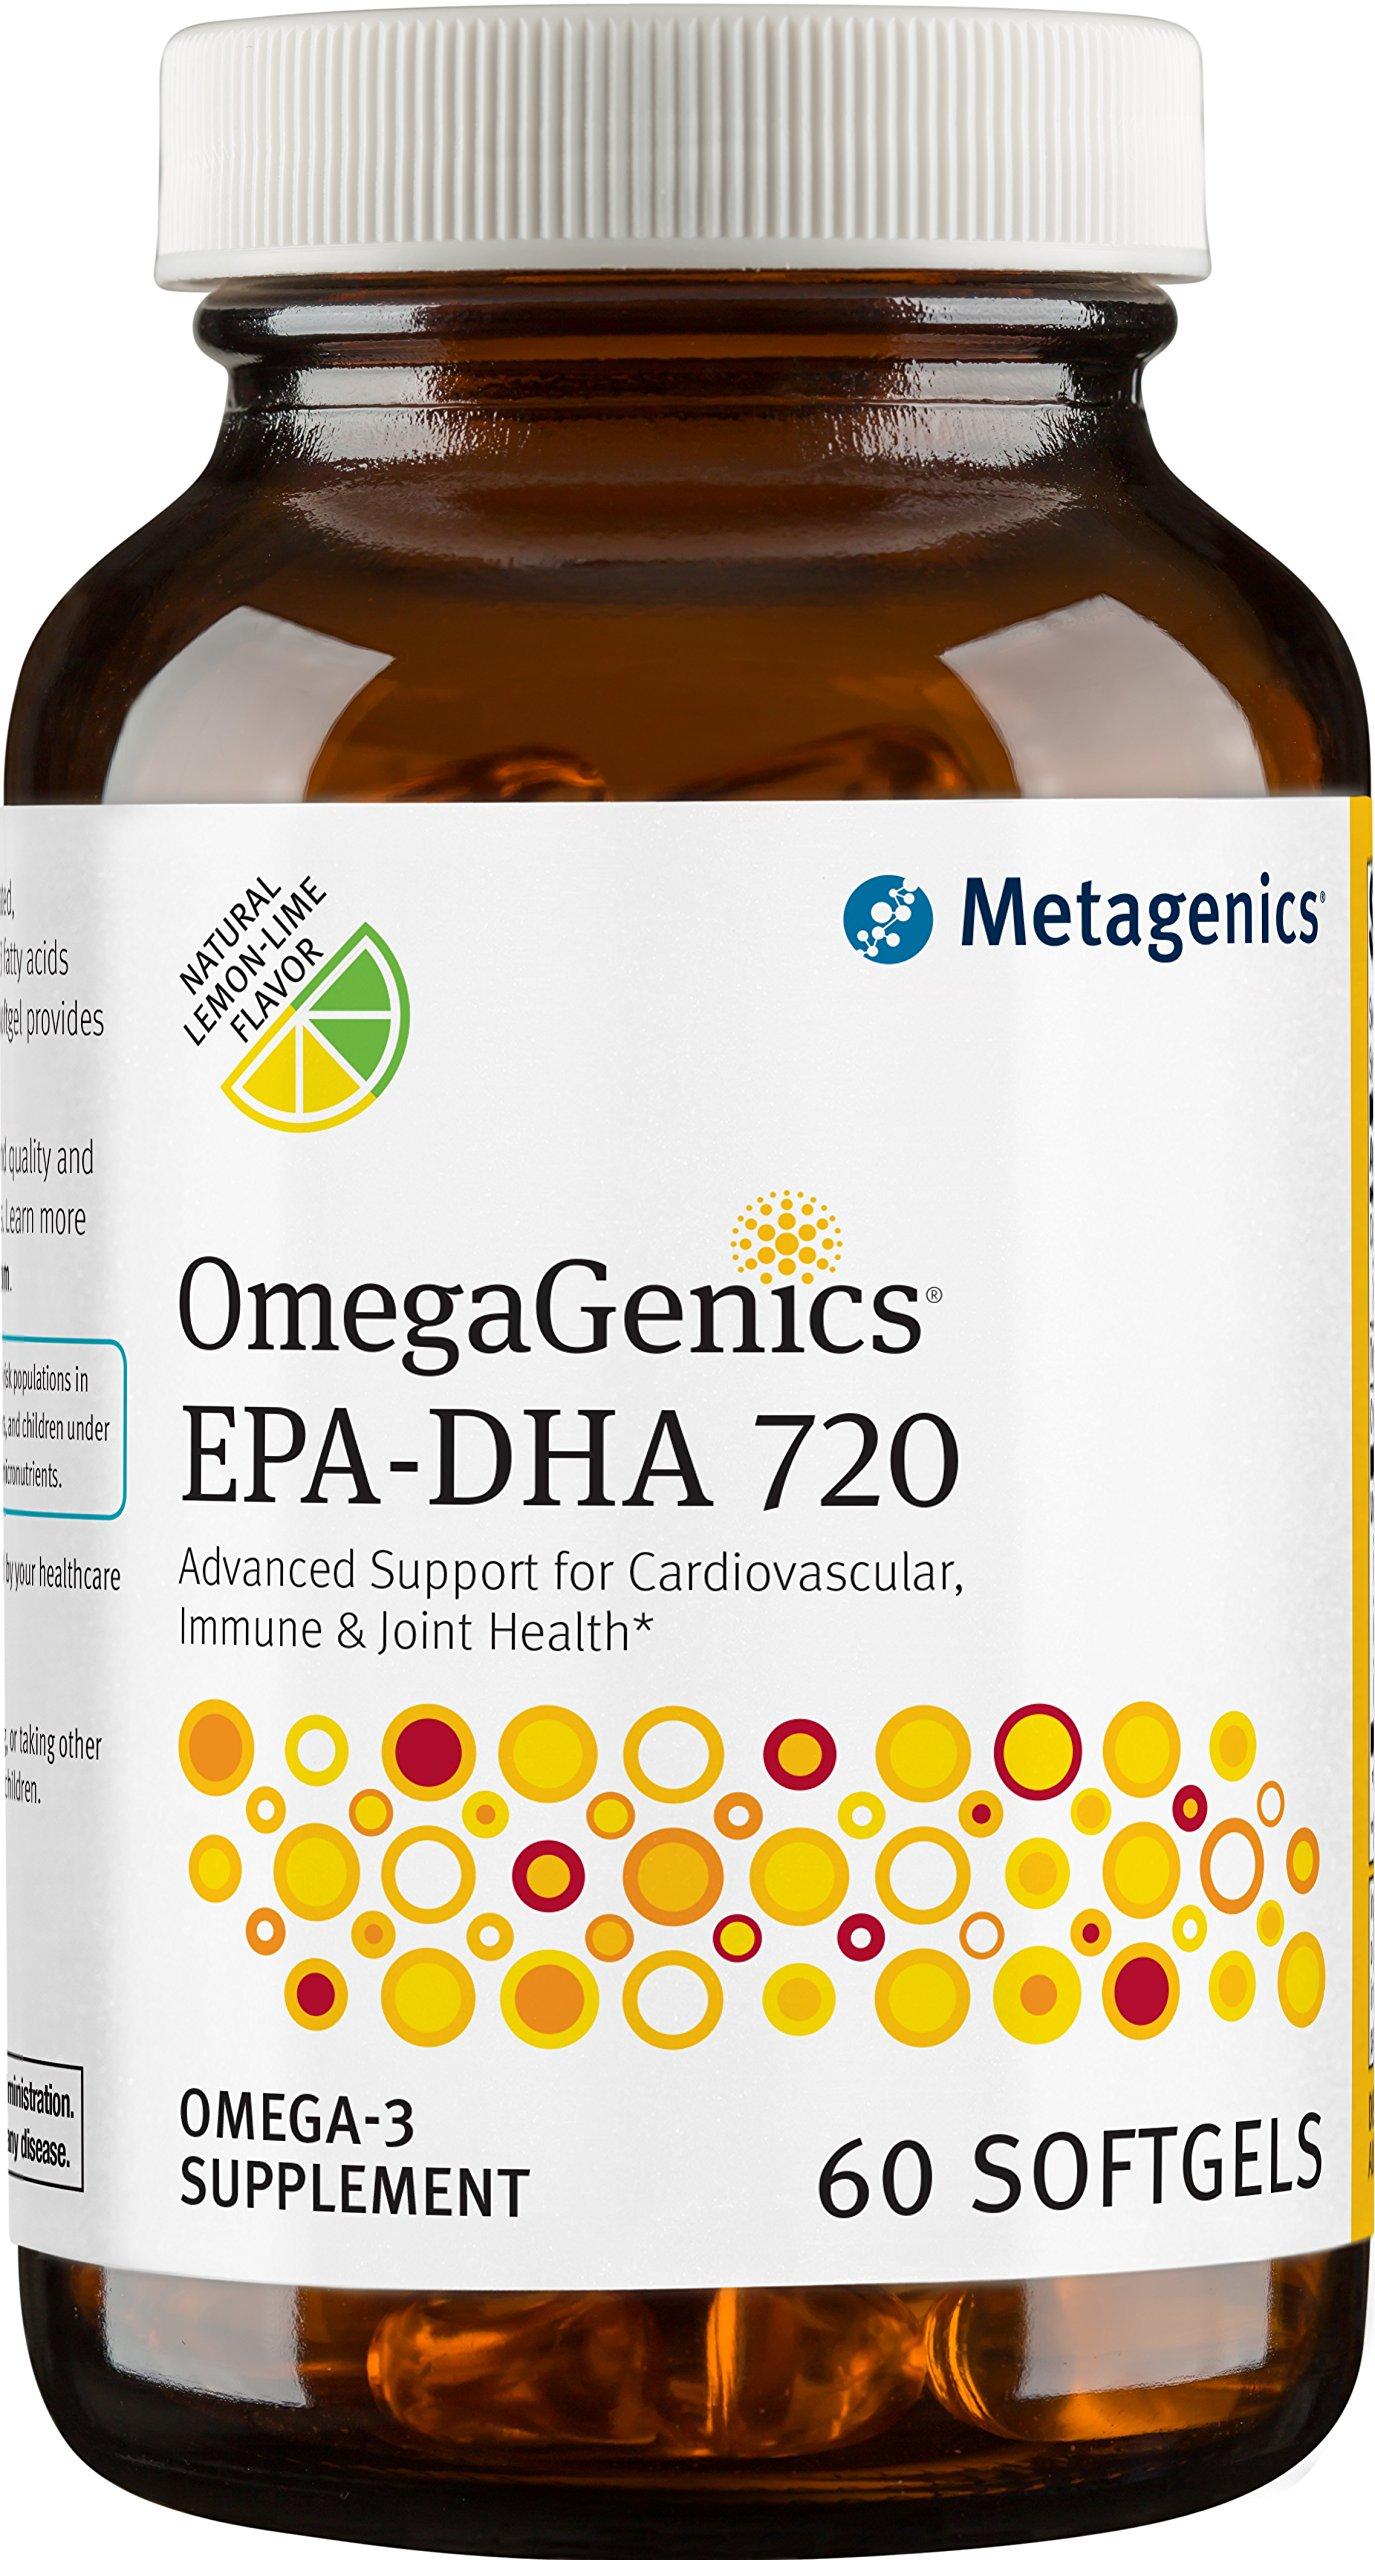 Metagenics - OmegaGenics EPA-DHA 720, 60 Count